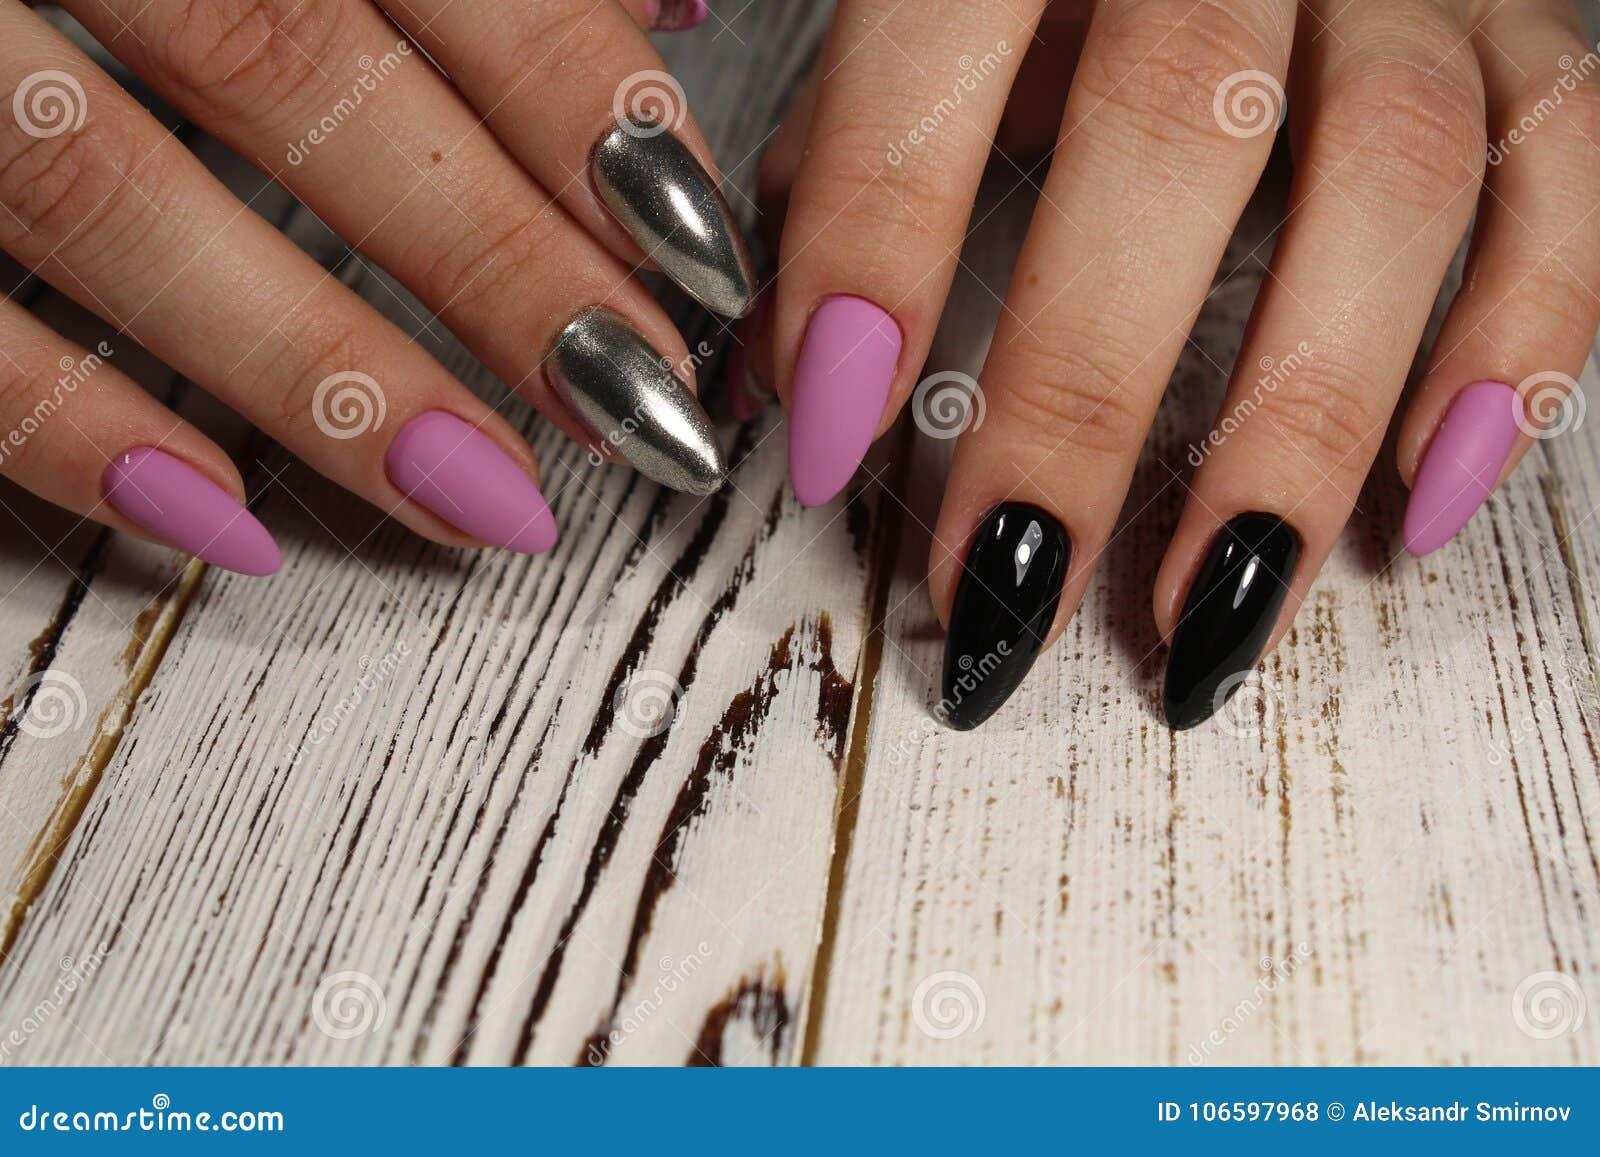 Manicure - Beauty Treatment Photo Of Nice Manicured Woman ...